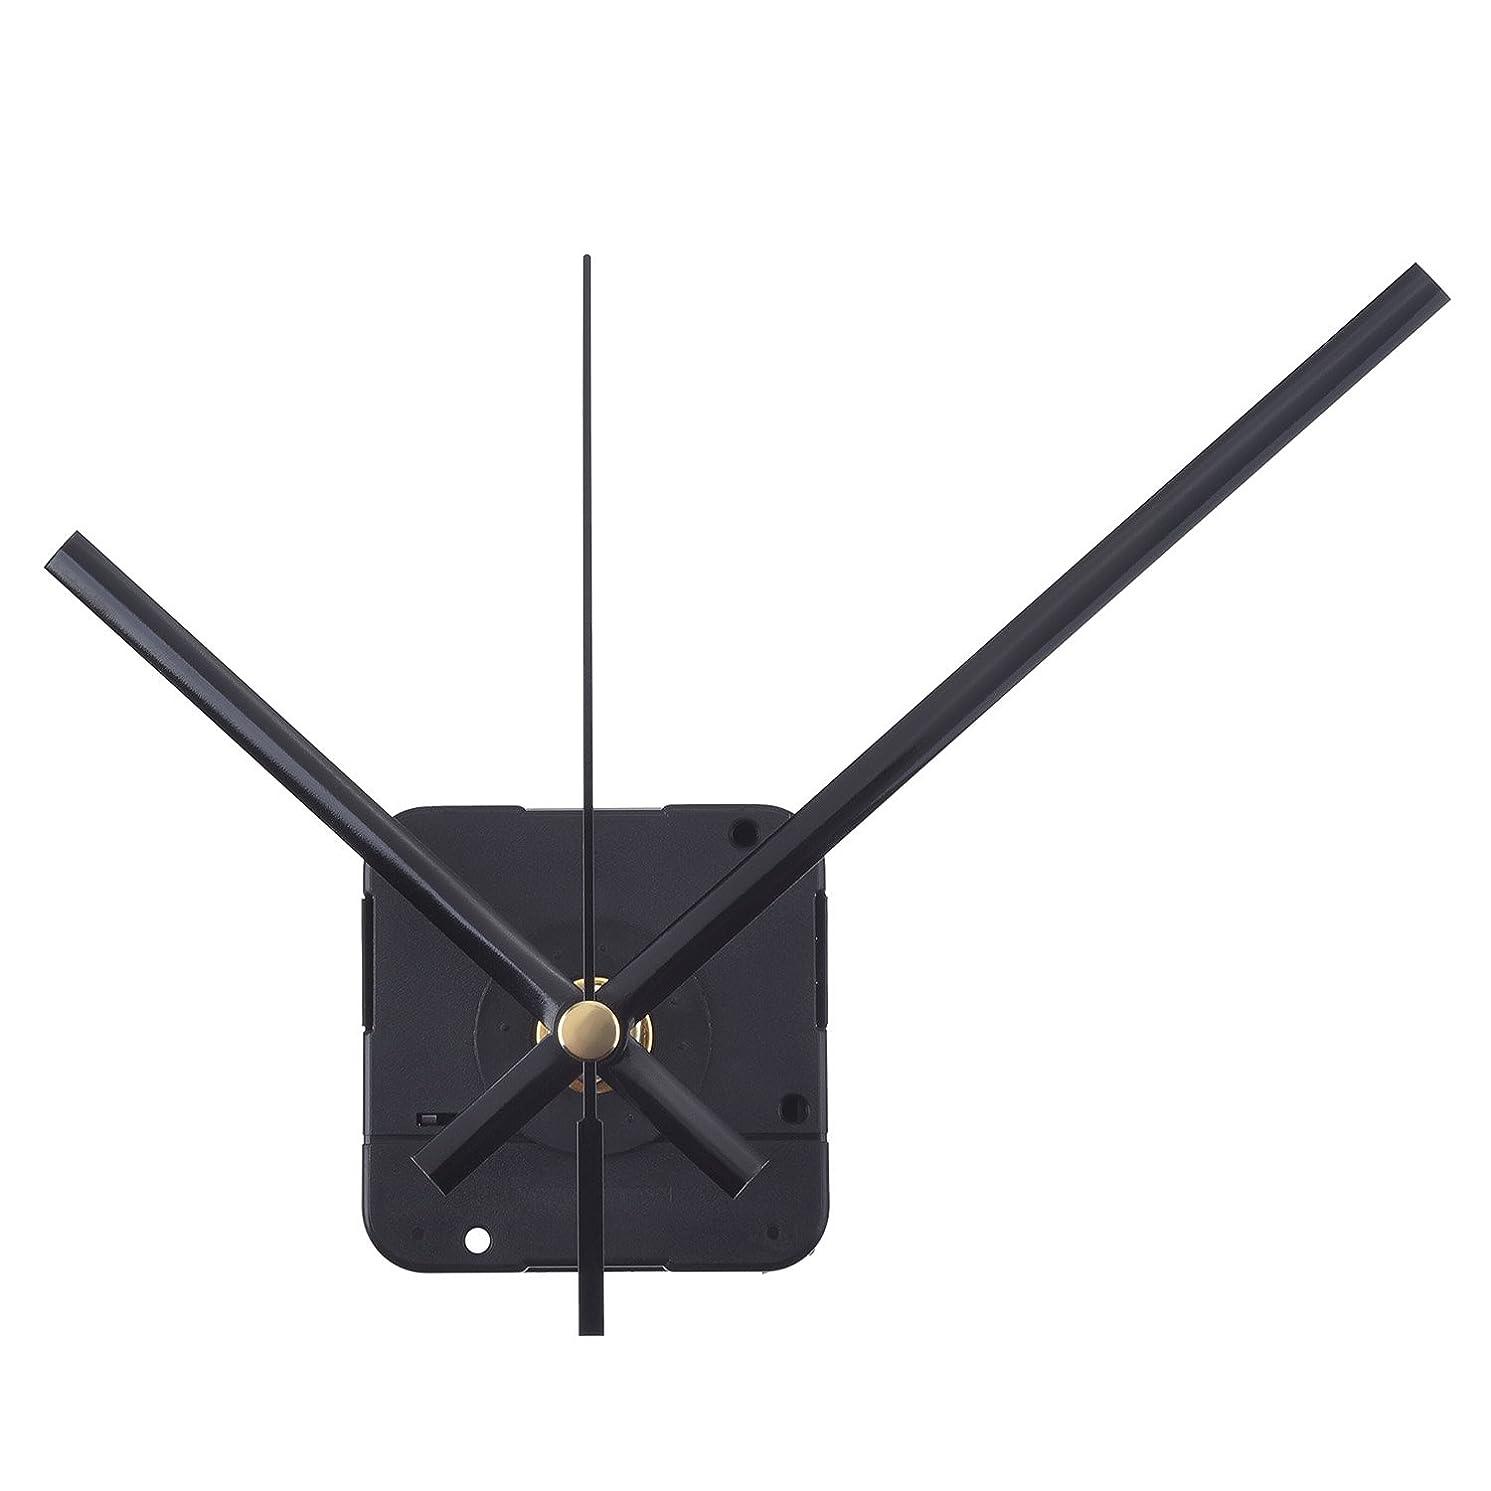 Mudder Long Spindle Quartz Clock Mechanism, 1/ 2 Inch Maximum Dial Thickness, 9/ 10 Inch Total Shaft Length (Black)